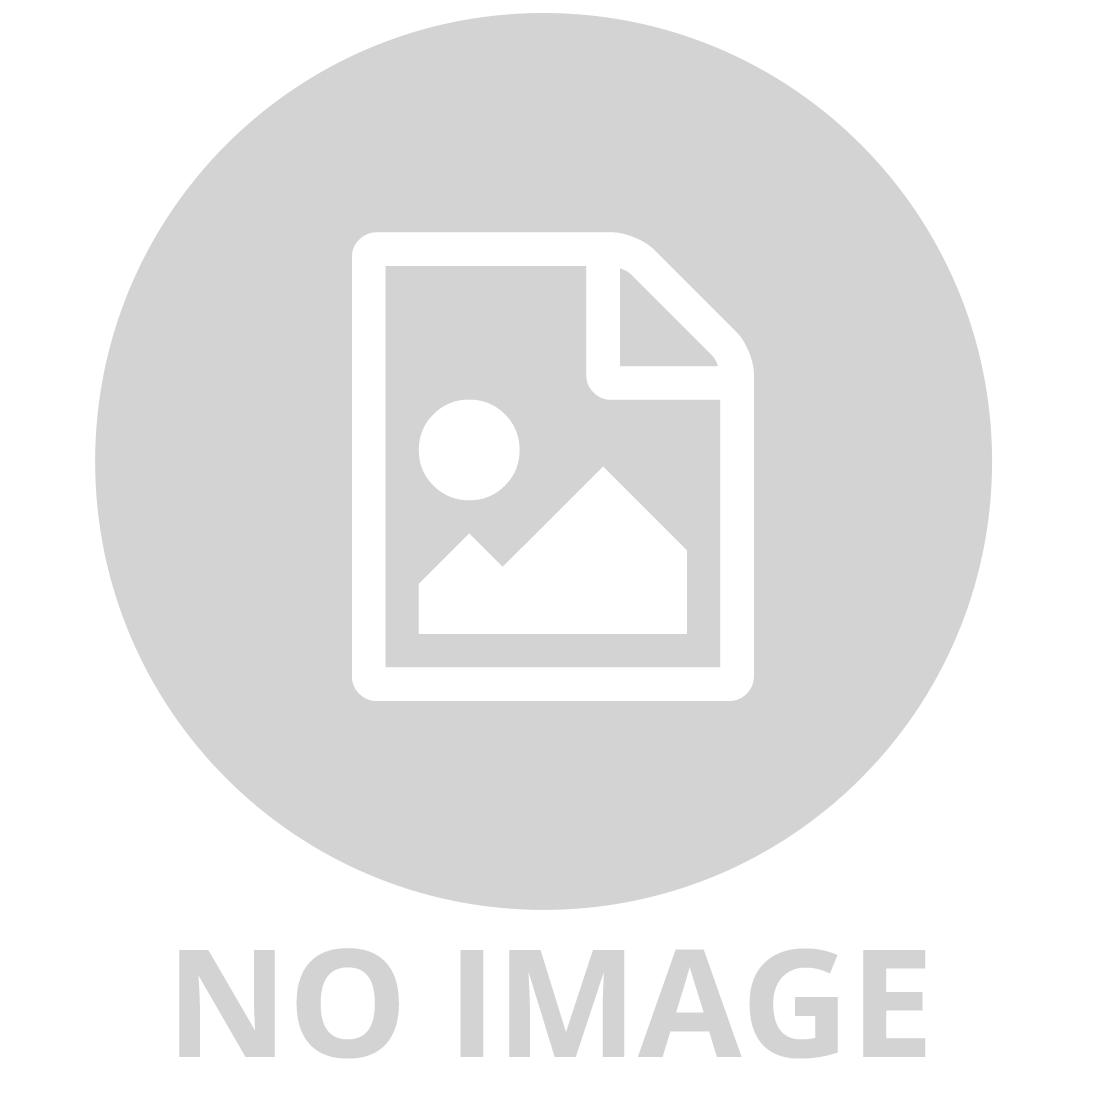 LEGO STAR WARS MICROFIGHTER 75194 TIE FIGHTER